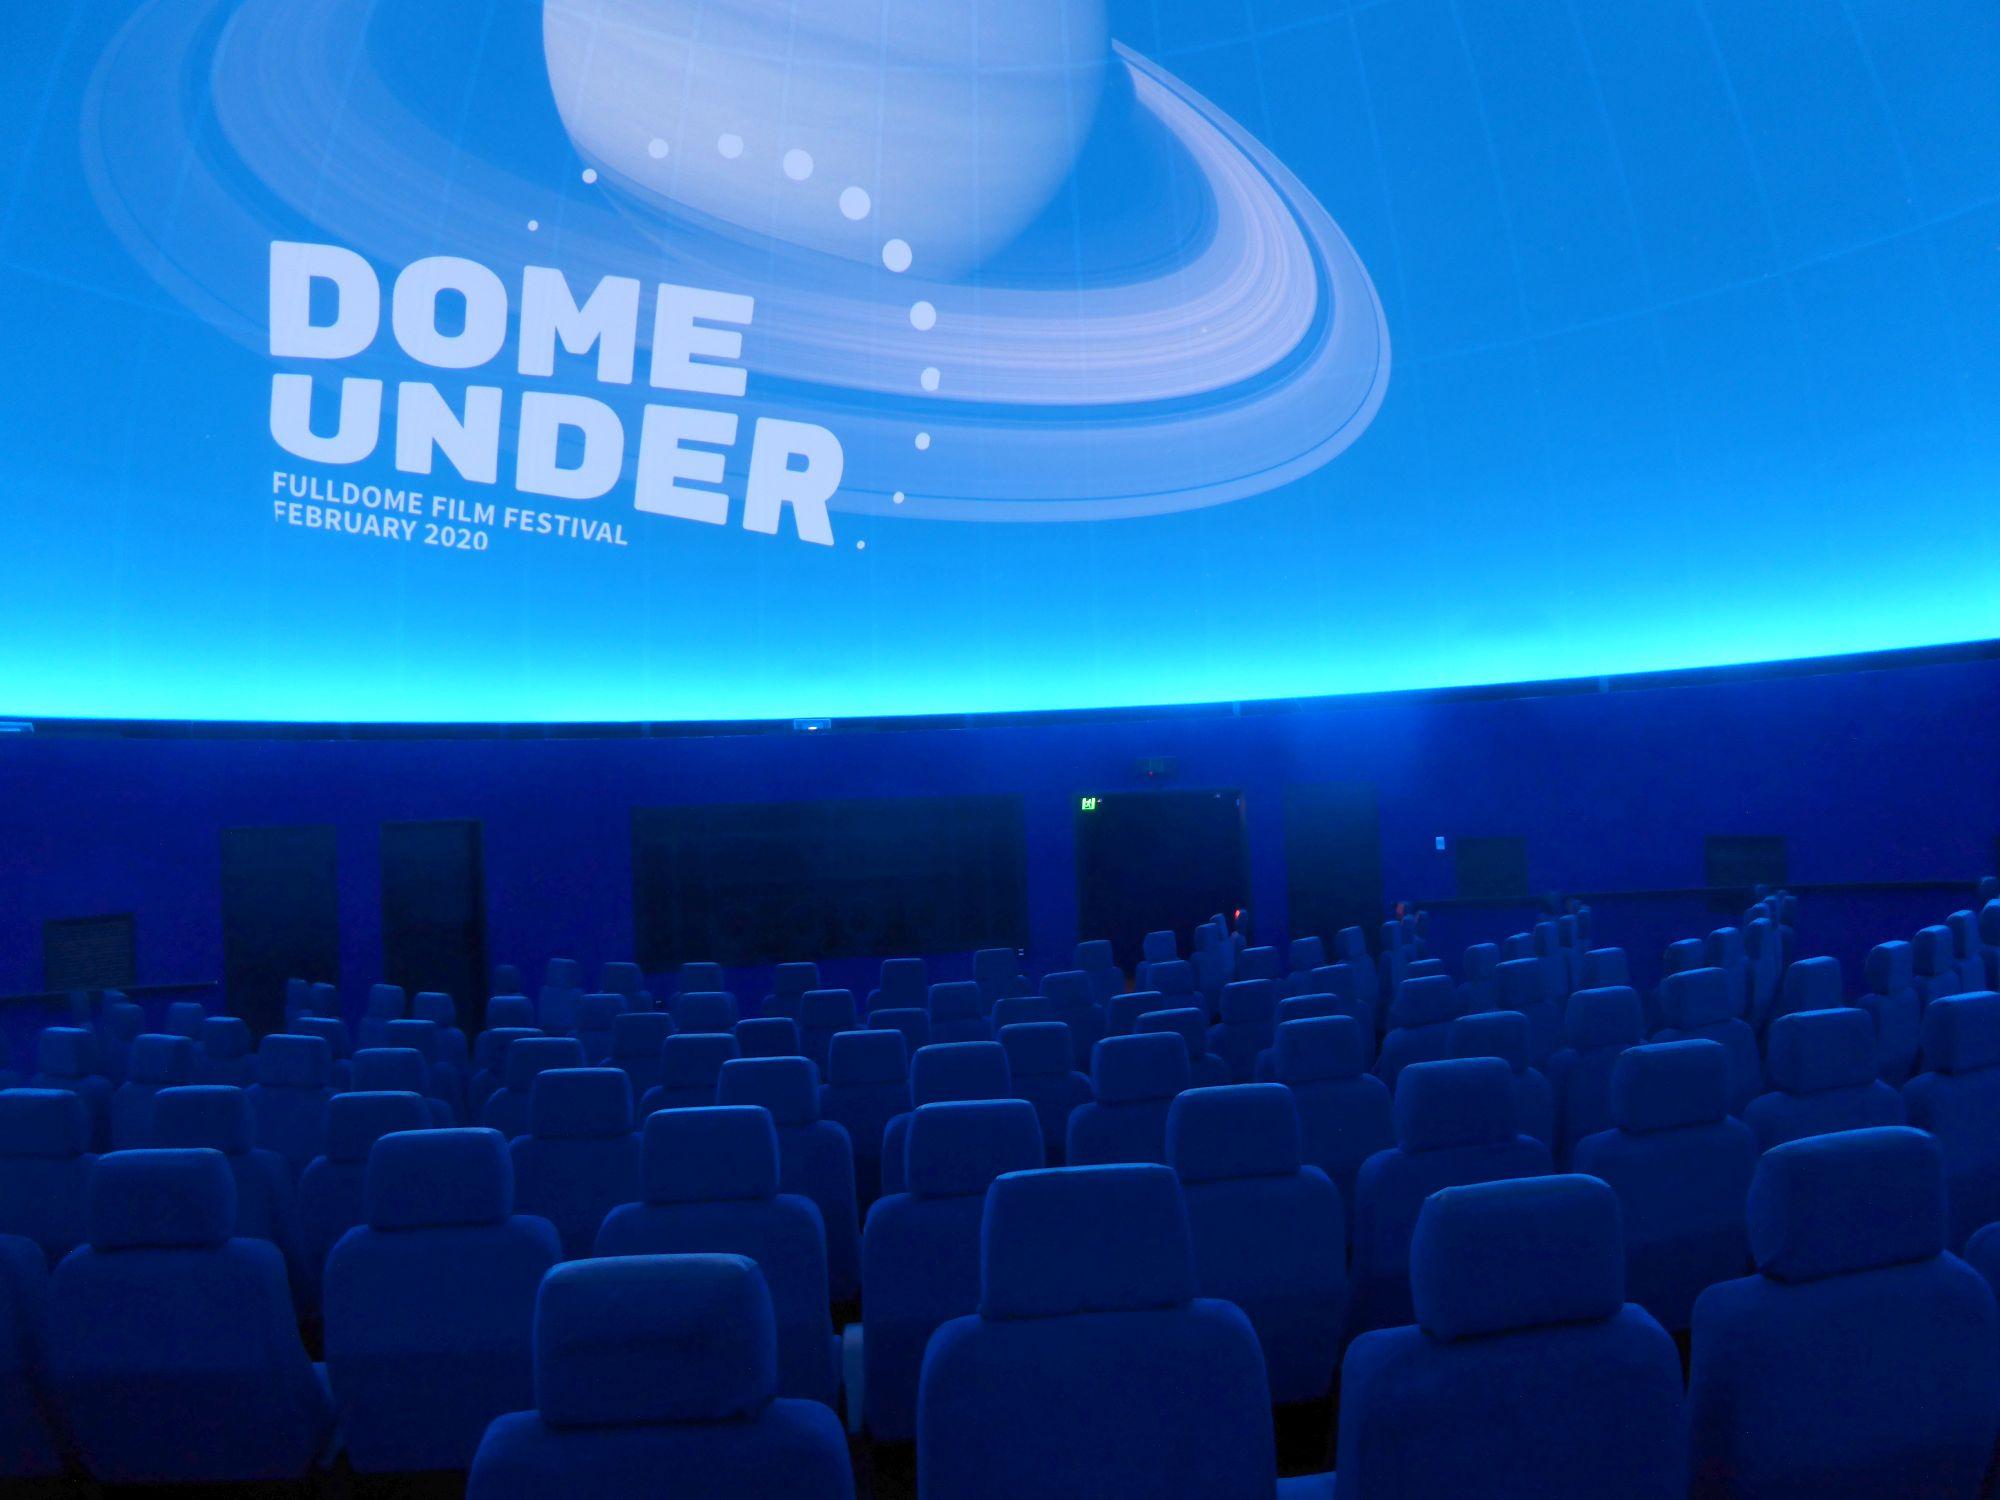 img news fulldome dome-under-festival